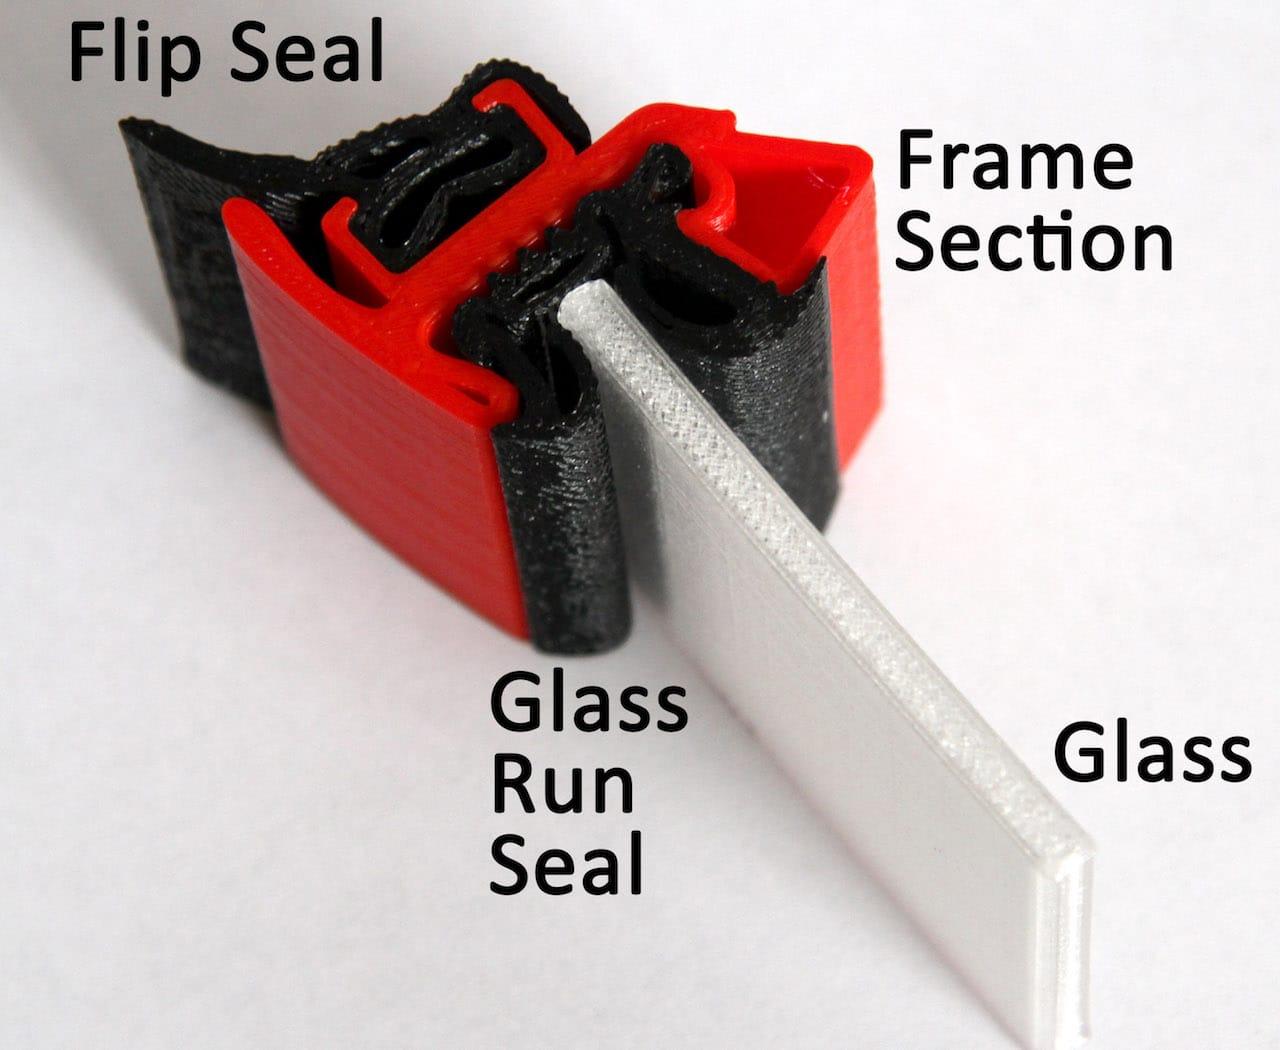 An example application of Verbatim's new PRIMALLOY BLACK flexible 3D printer filametn